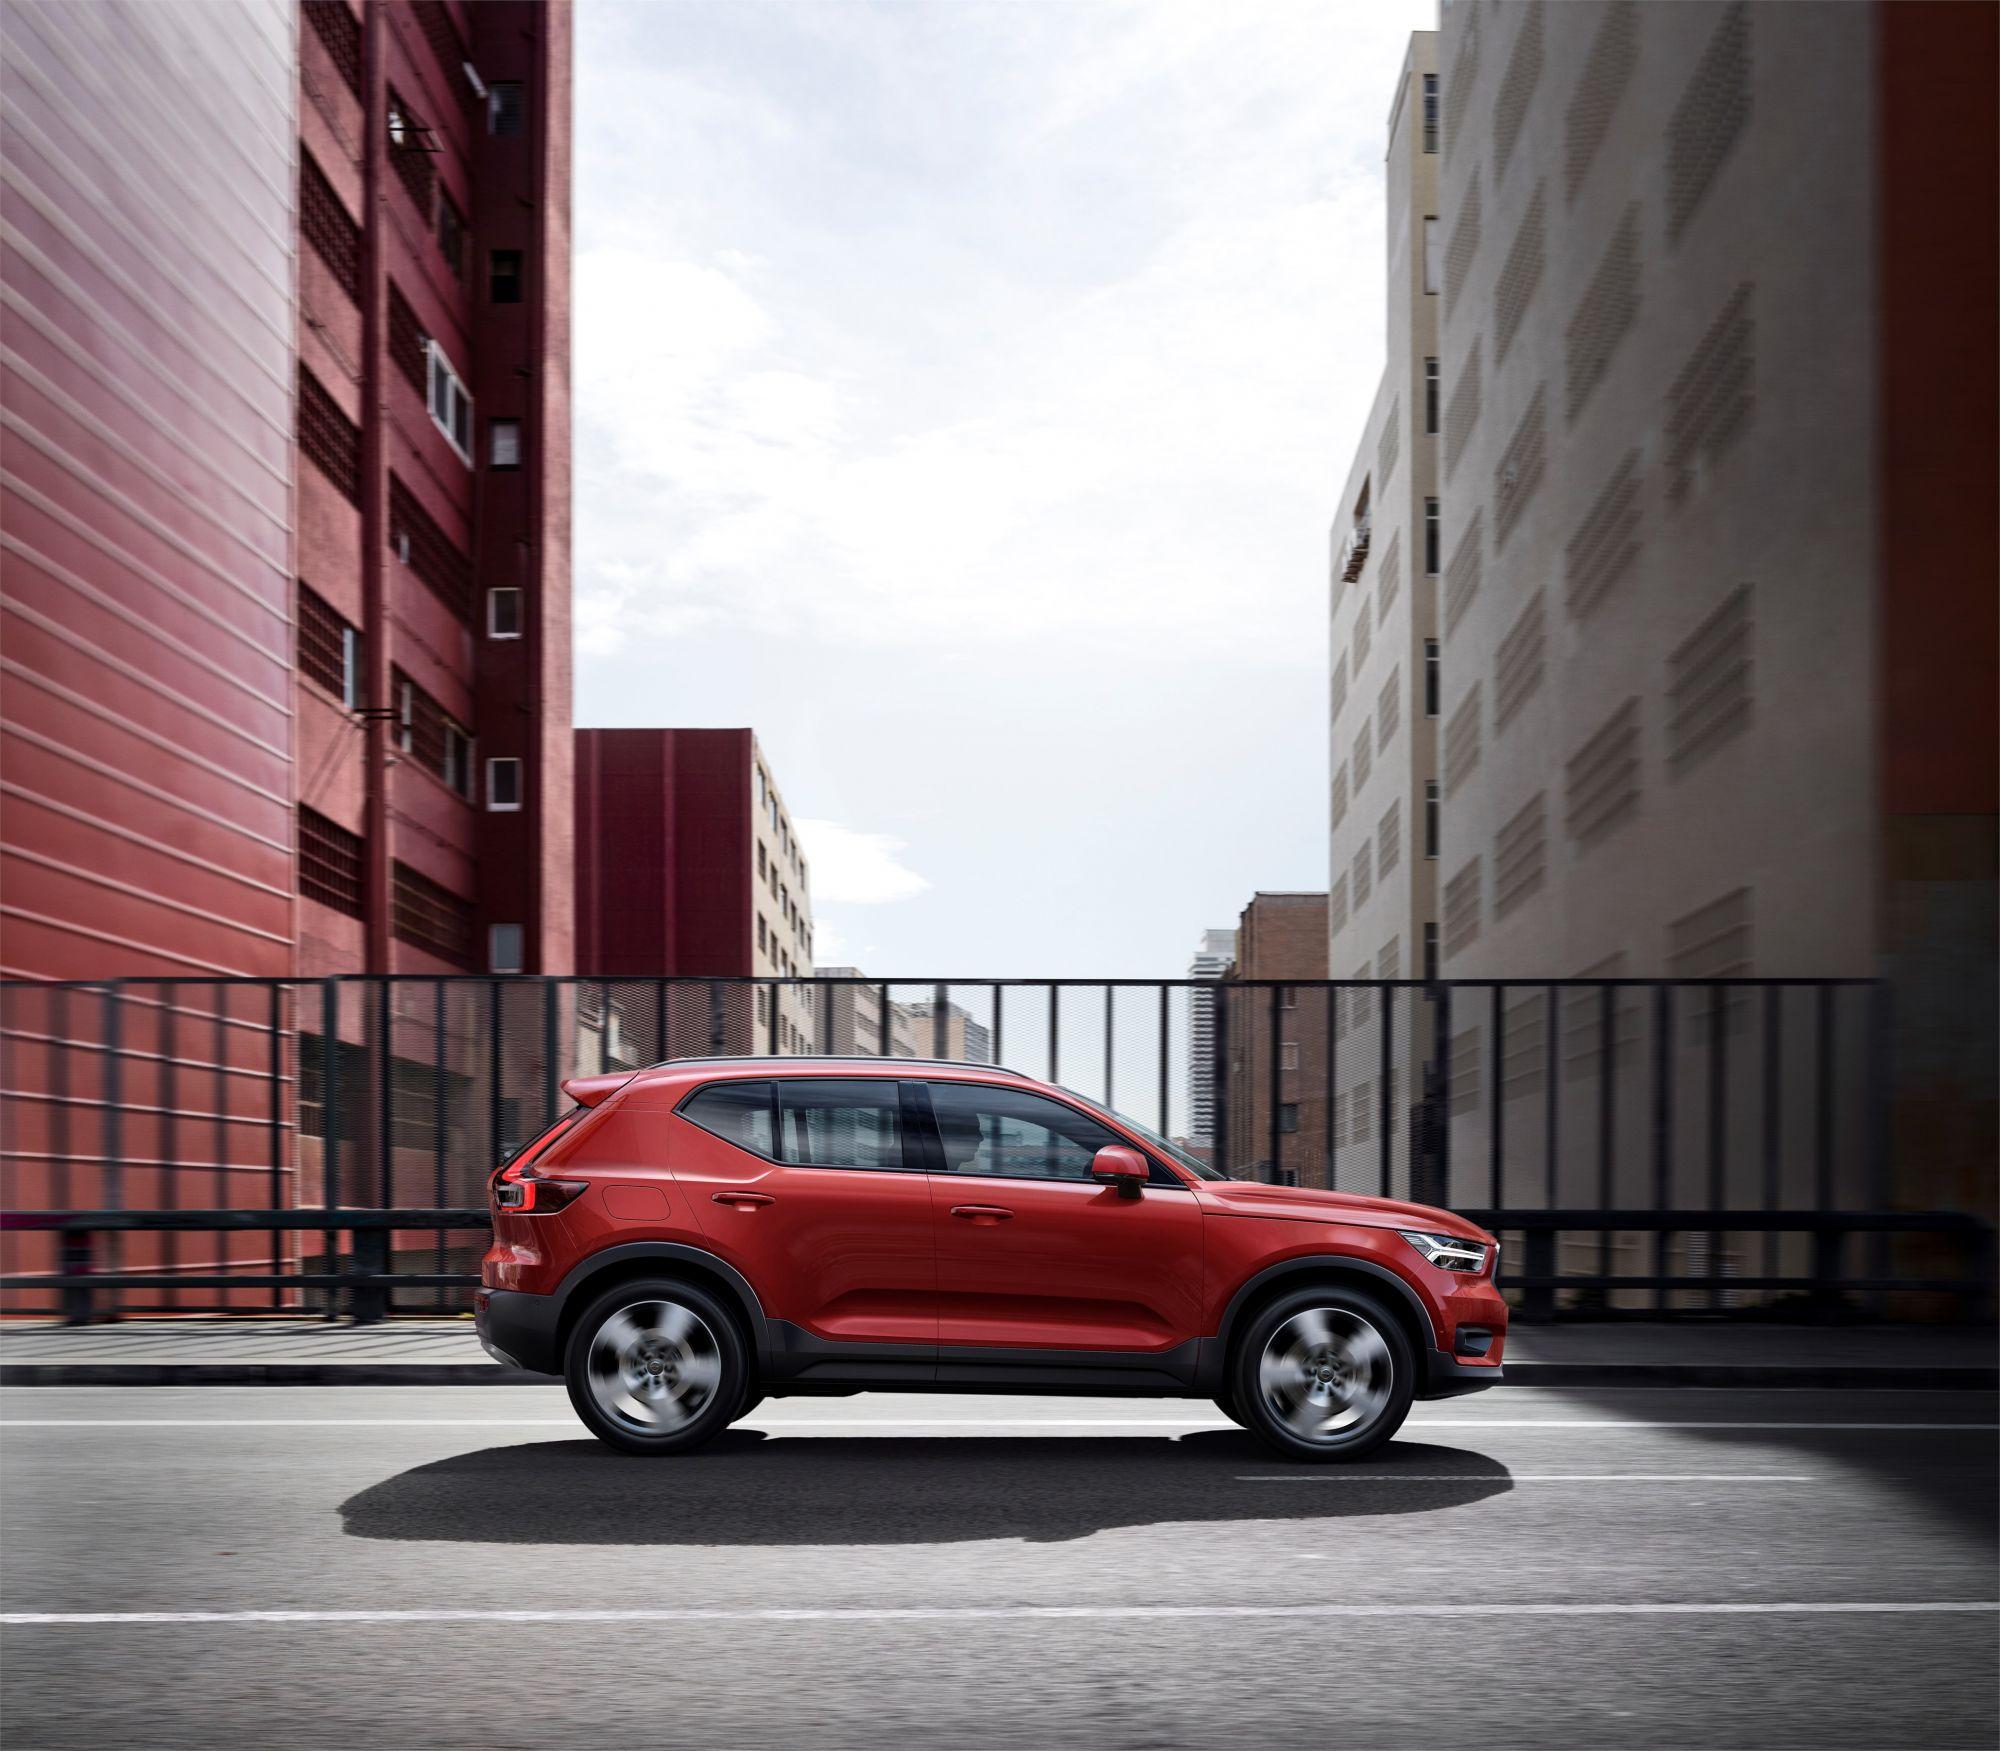 Volvo Car Wallpaper: Volvo Stellt Kompakt-SUV XC40 Vor